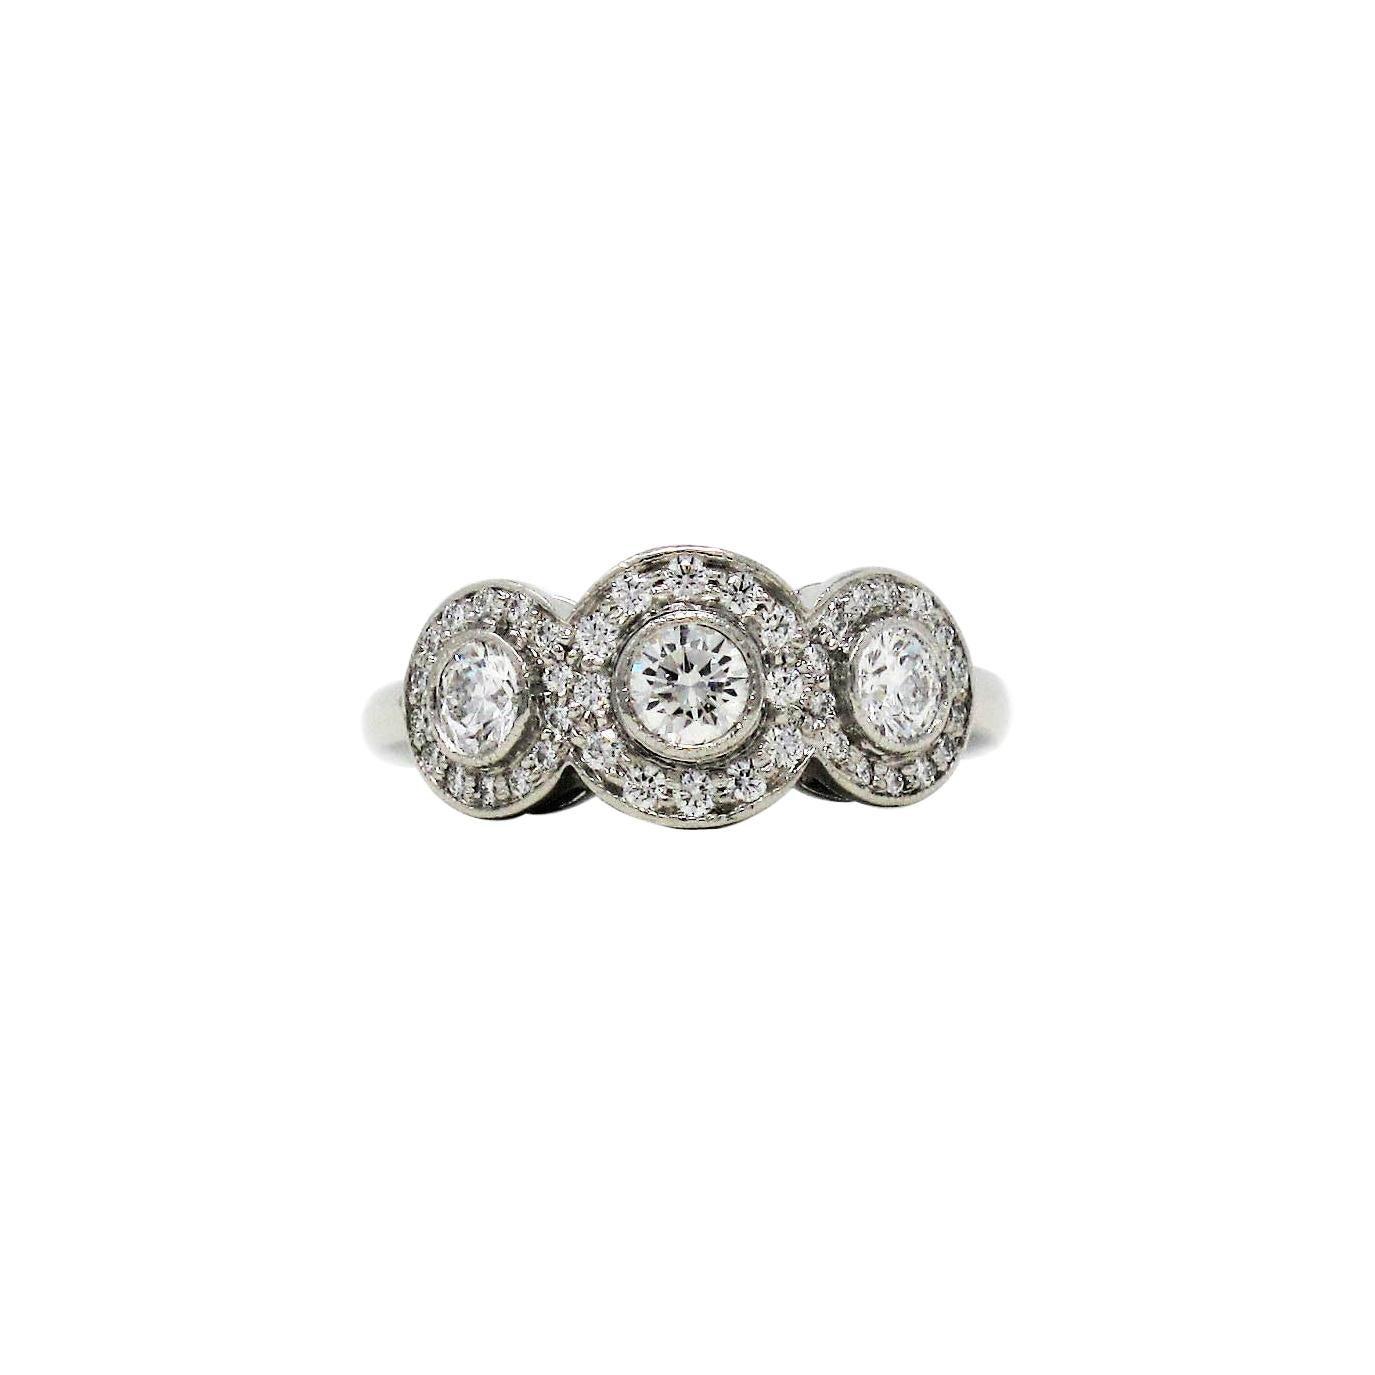 Tiffany & Co. Three Stone Circlet Diamond Halo Ring in Platinum .55 Carats Total